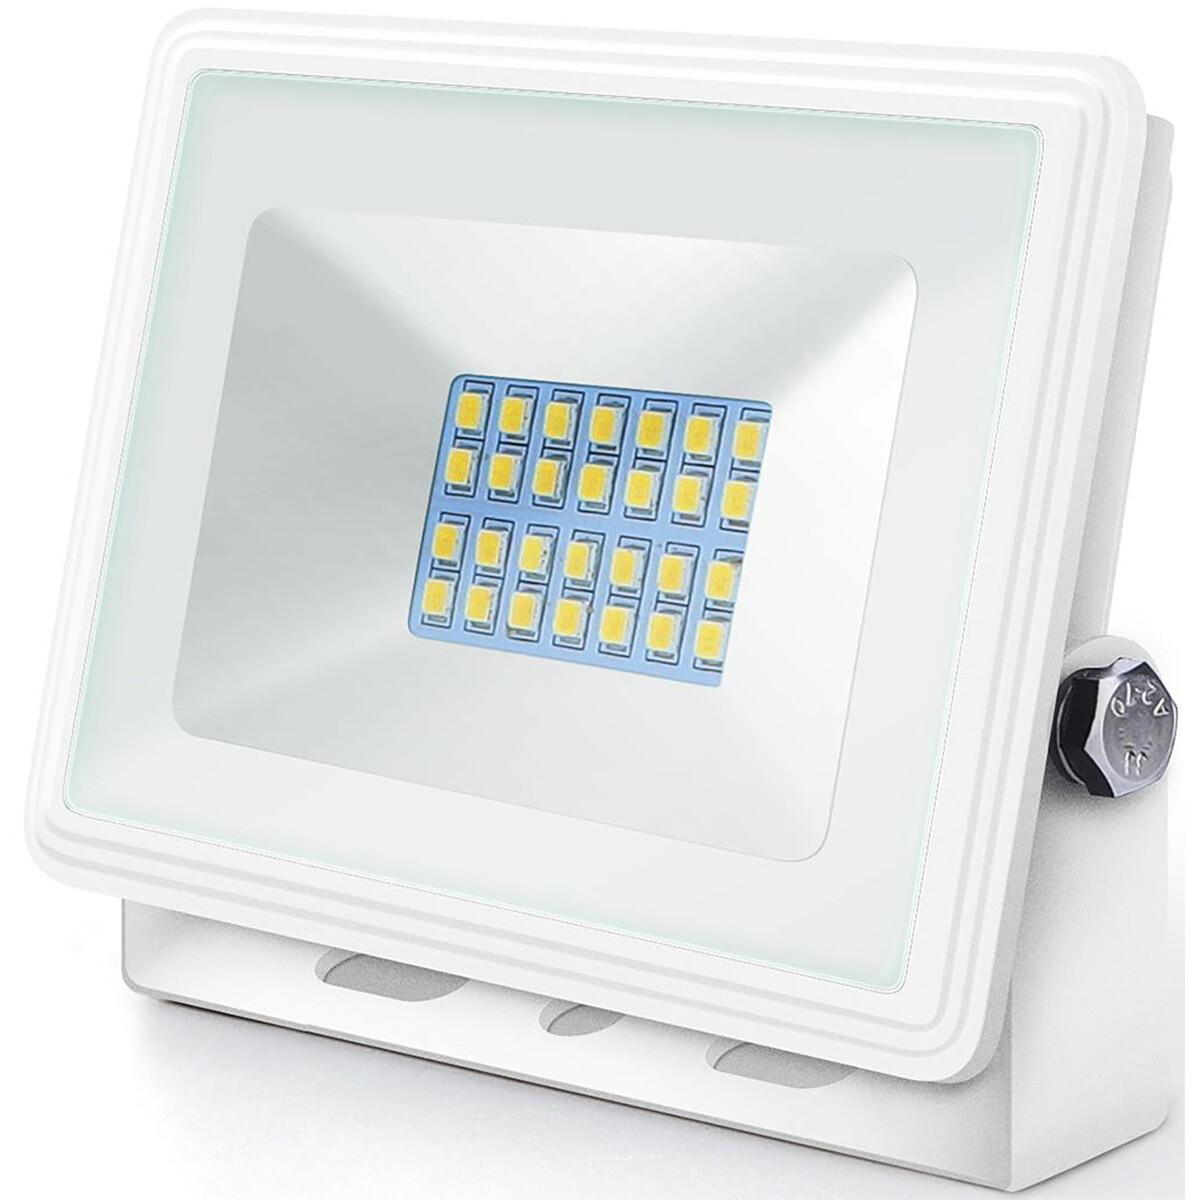 LED Bouwlamp 20 Watt - LED Schijnwerper - Aigi Iglo - Natuurlijk Wit 4000K - Waterdicht IP65 - Mat W